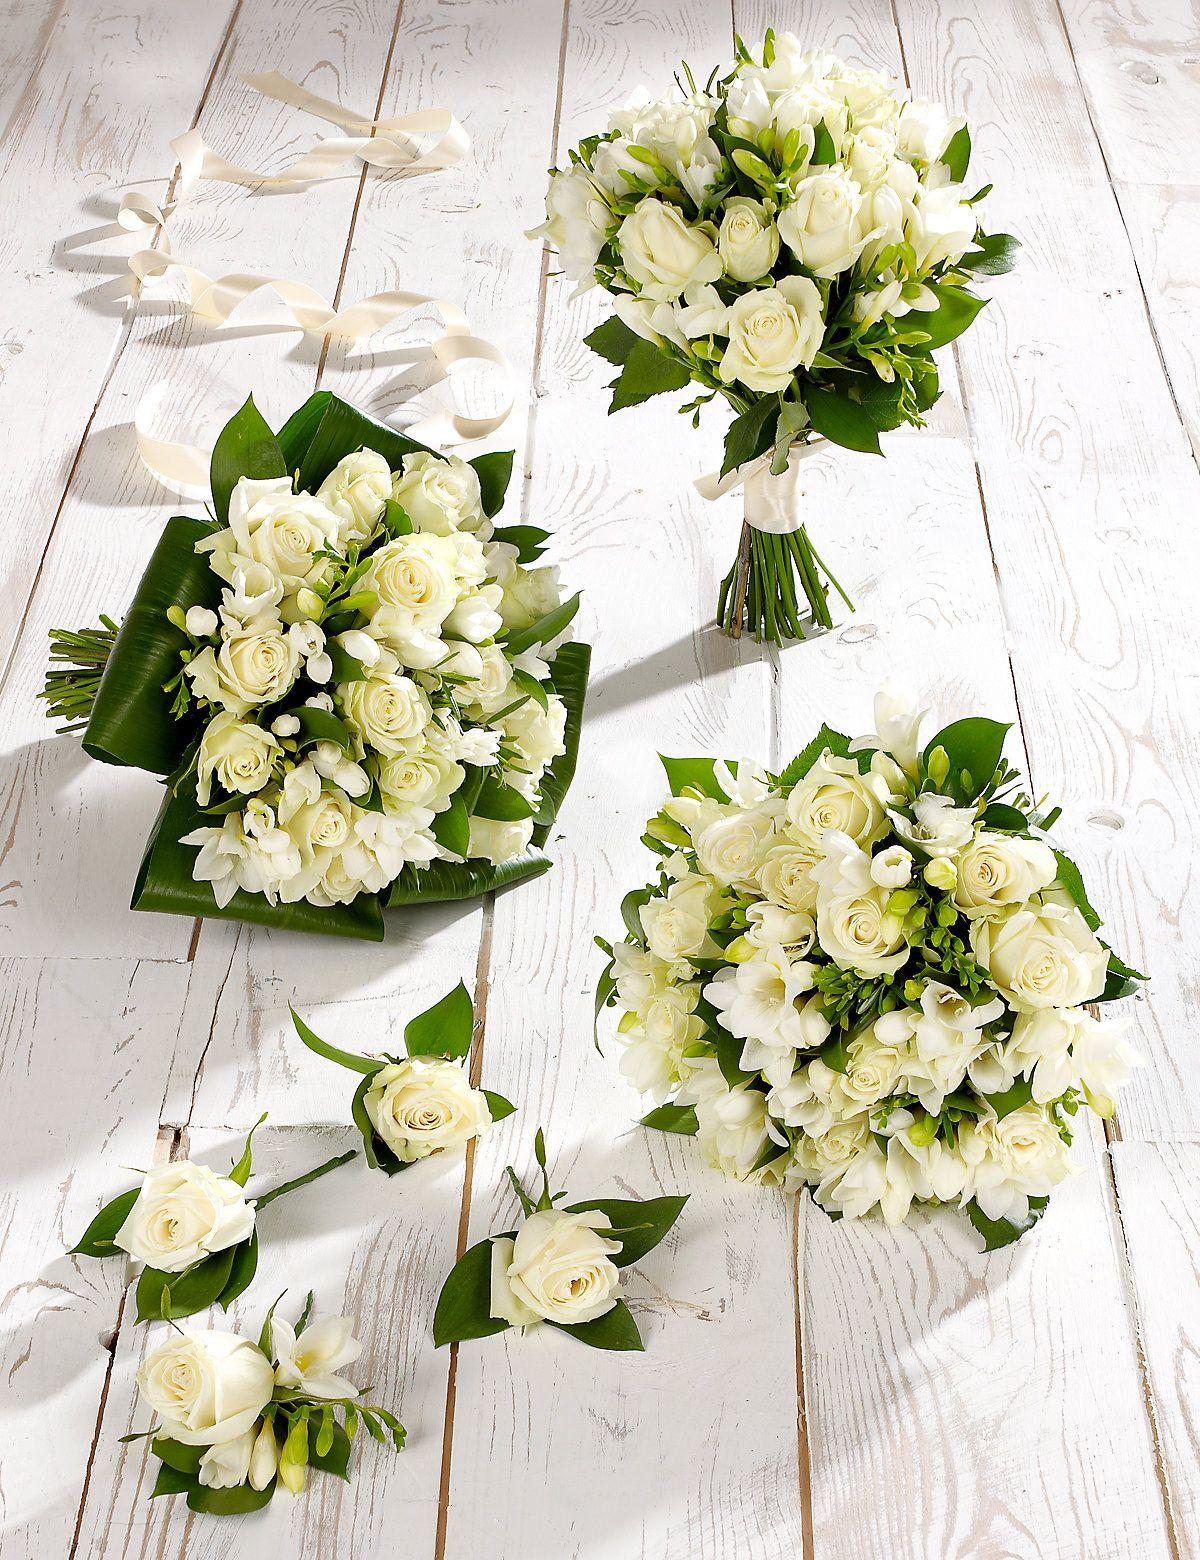 White rose freesia wedding flowers collection 2 flower white rose freesia wedding flowers collection 2 izmirmasajfo Gallery